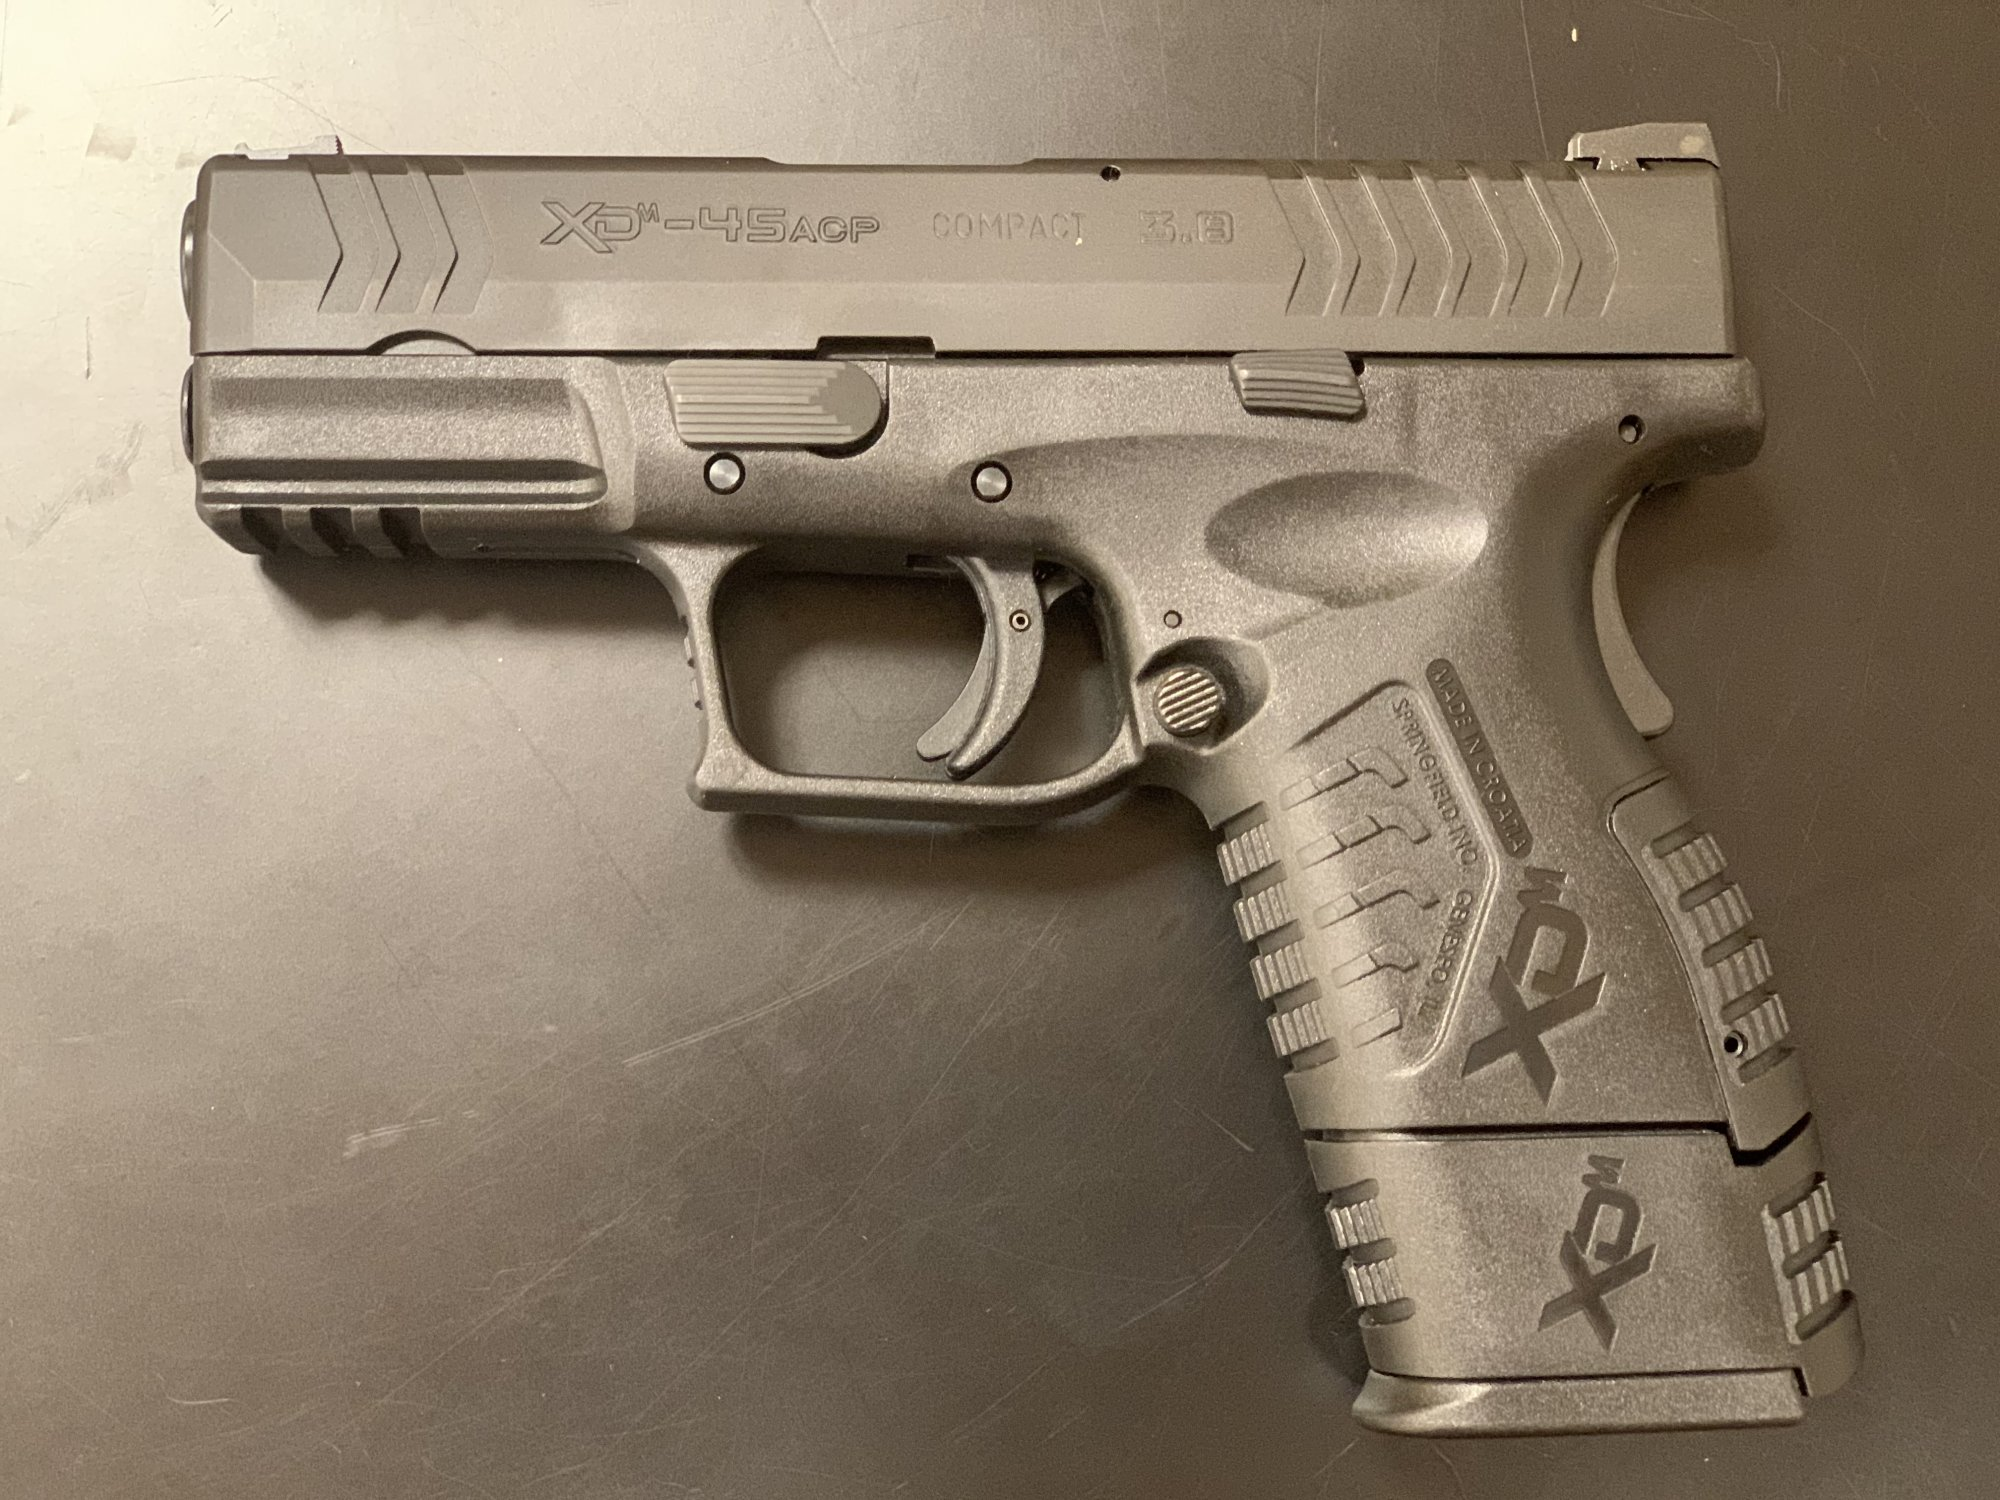 Springfield XDM45acp Semi Automatic Pistol -  Black